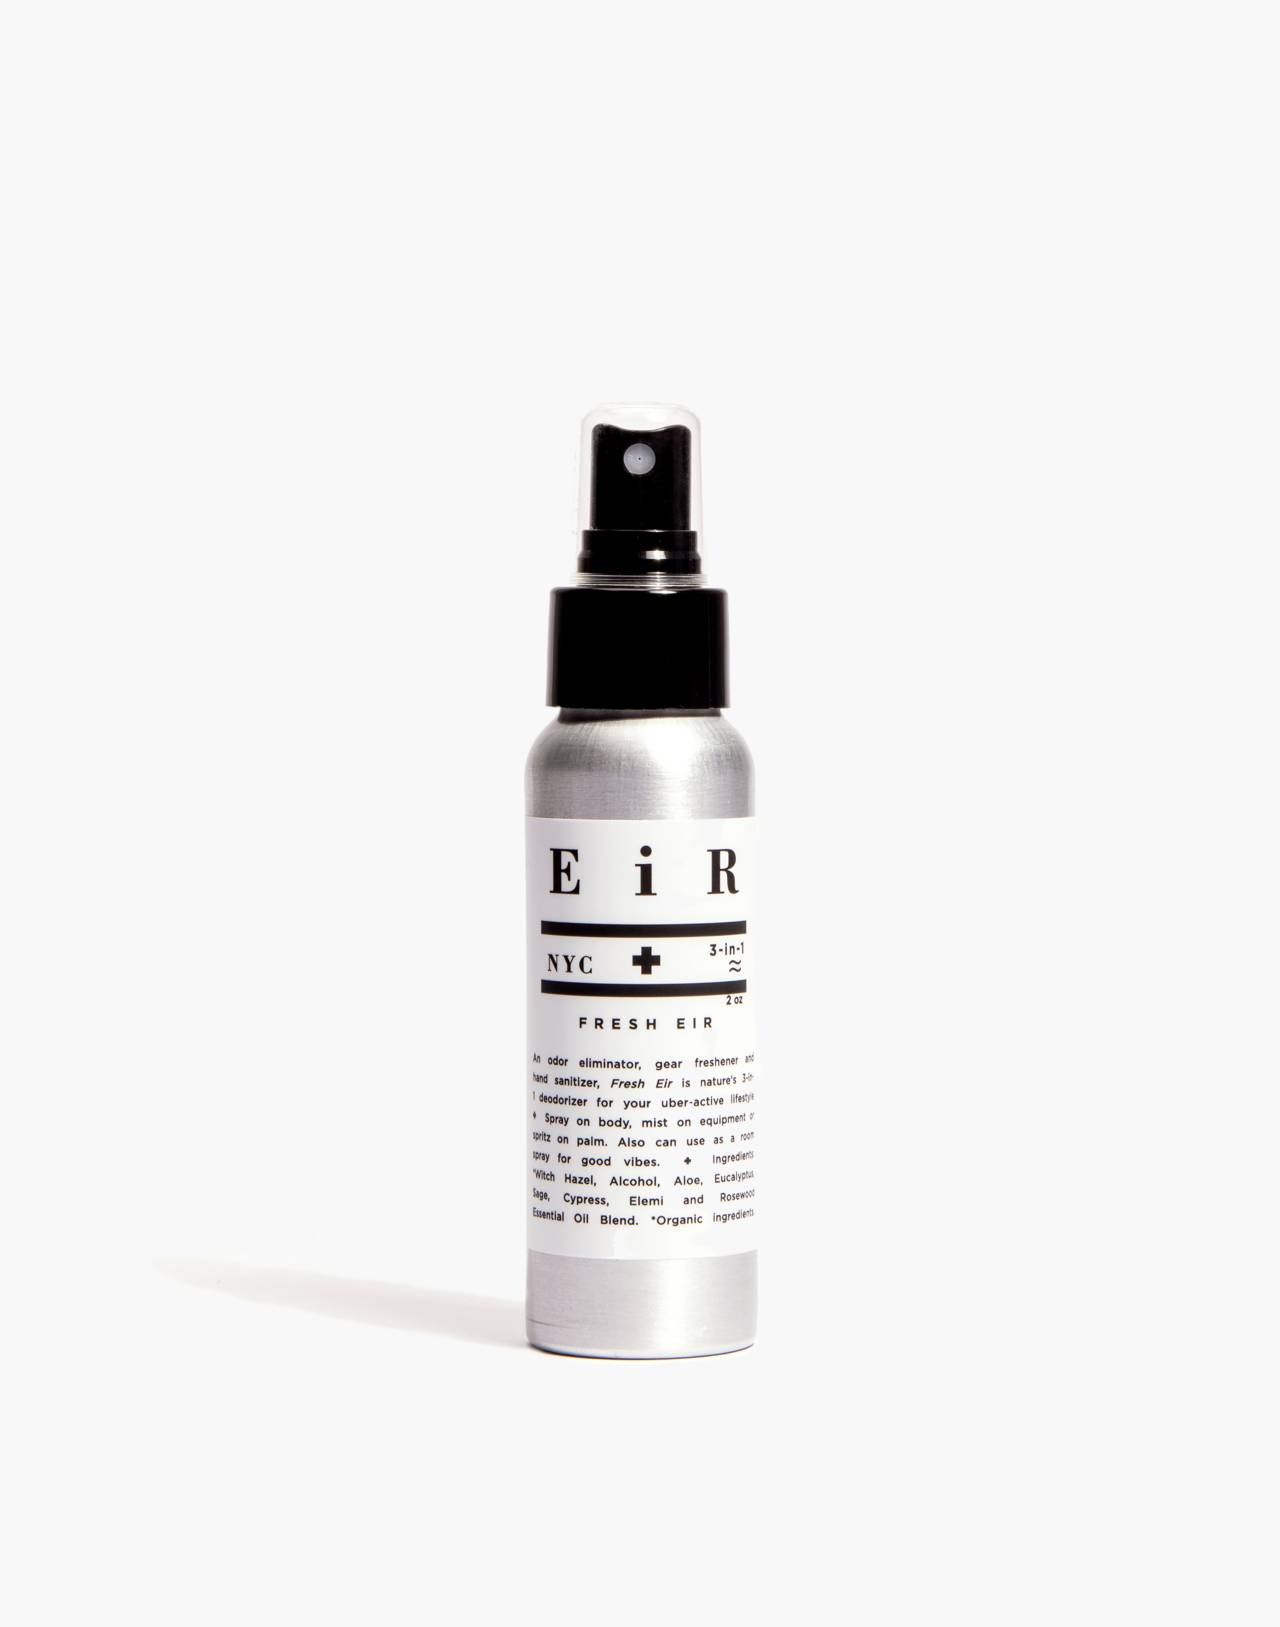 Eir NYC® Fresh Eir Hand Sanitizer and Deodorizing Spray in one color image 1